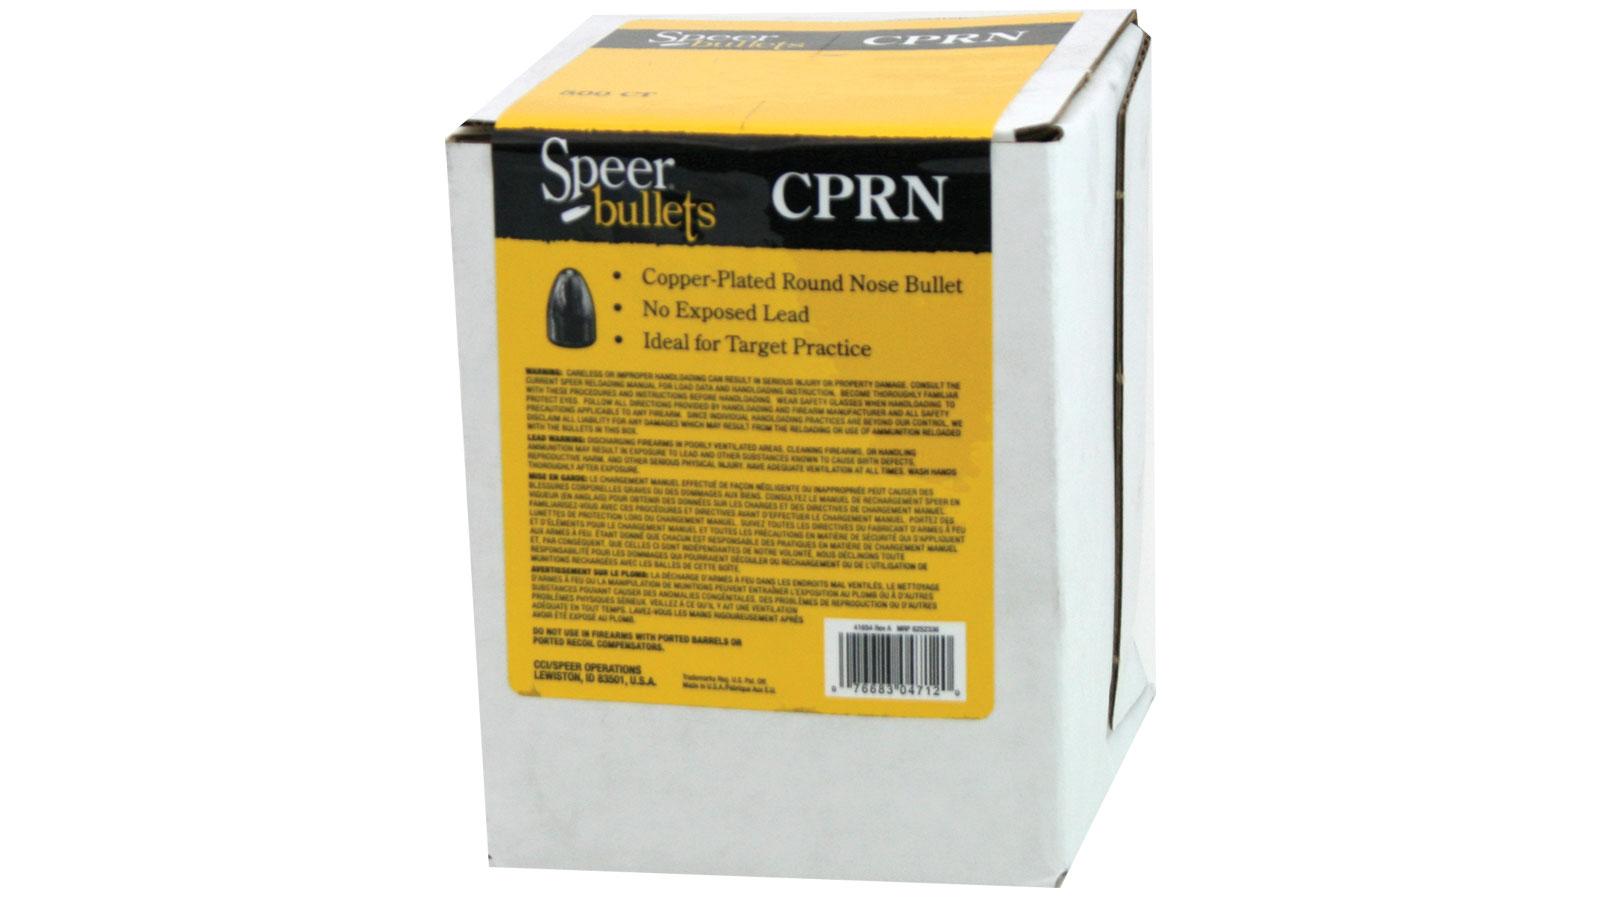 Speer Bullets 4714 Handgun Plinking  45 Caliber .454 230 GR Round Nose Value Pack 500 Box